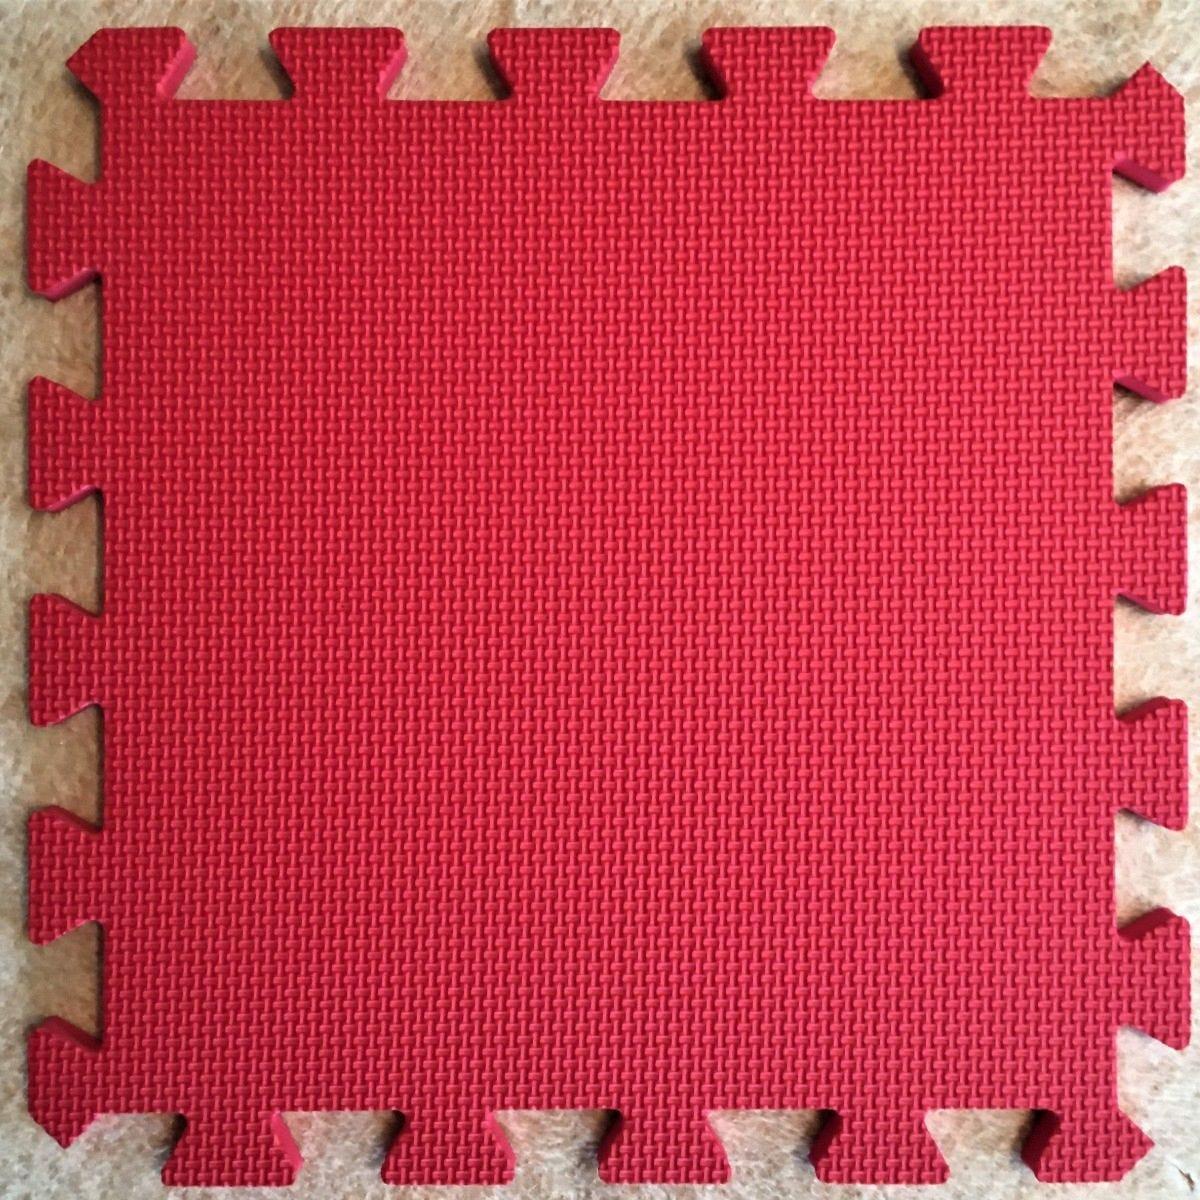 Warm Floor Playhouse Tiling Kit - Red